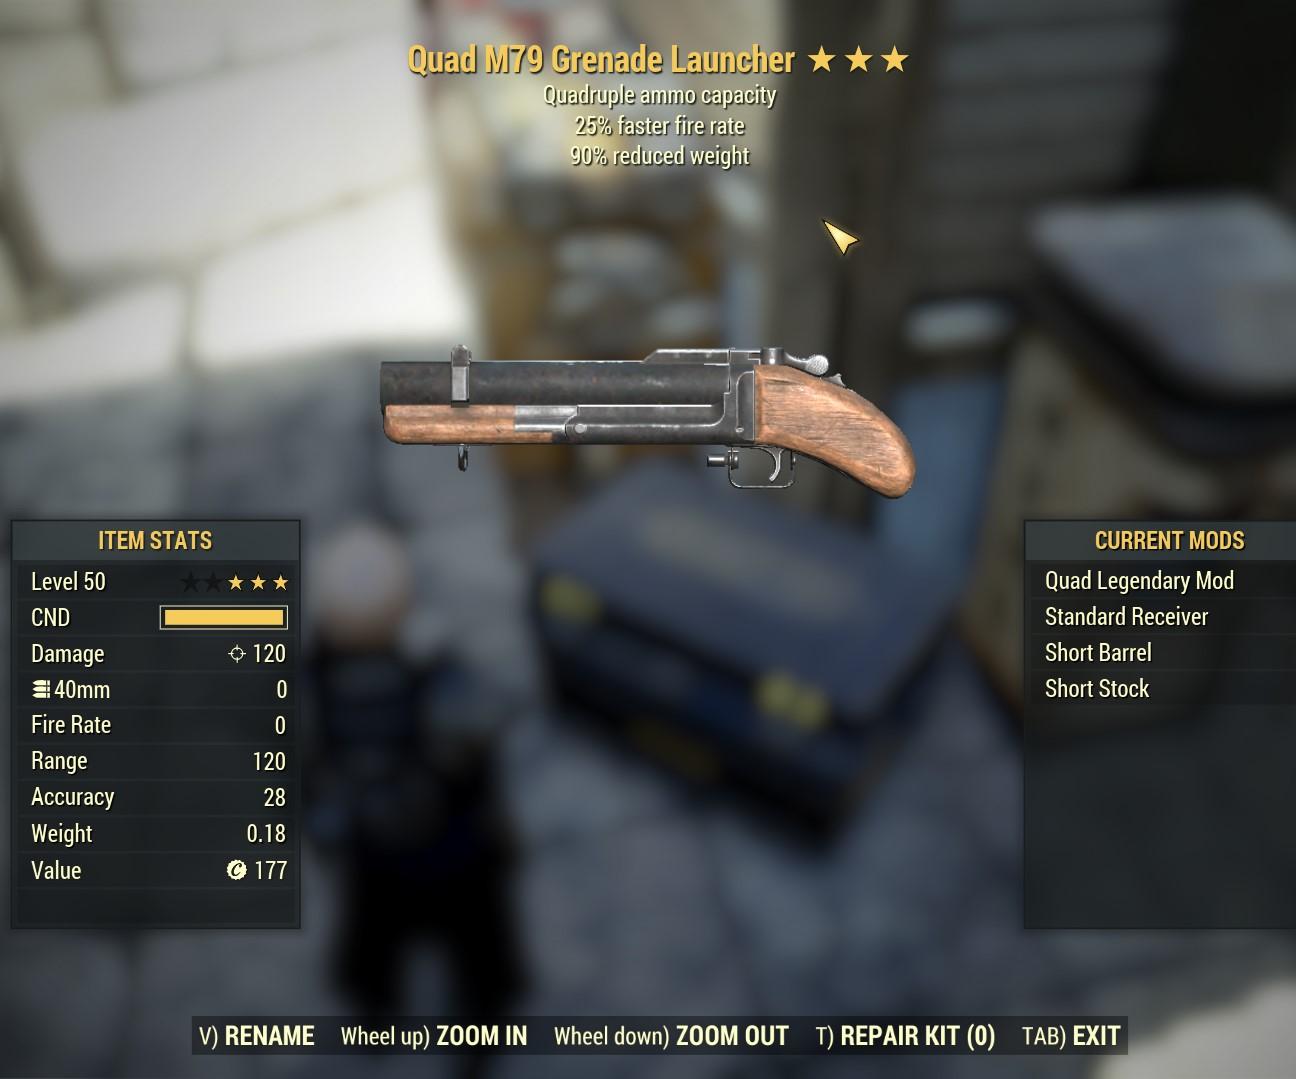 Quad M79 Grenade Launcher (25% FFR 90% RW)